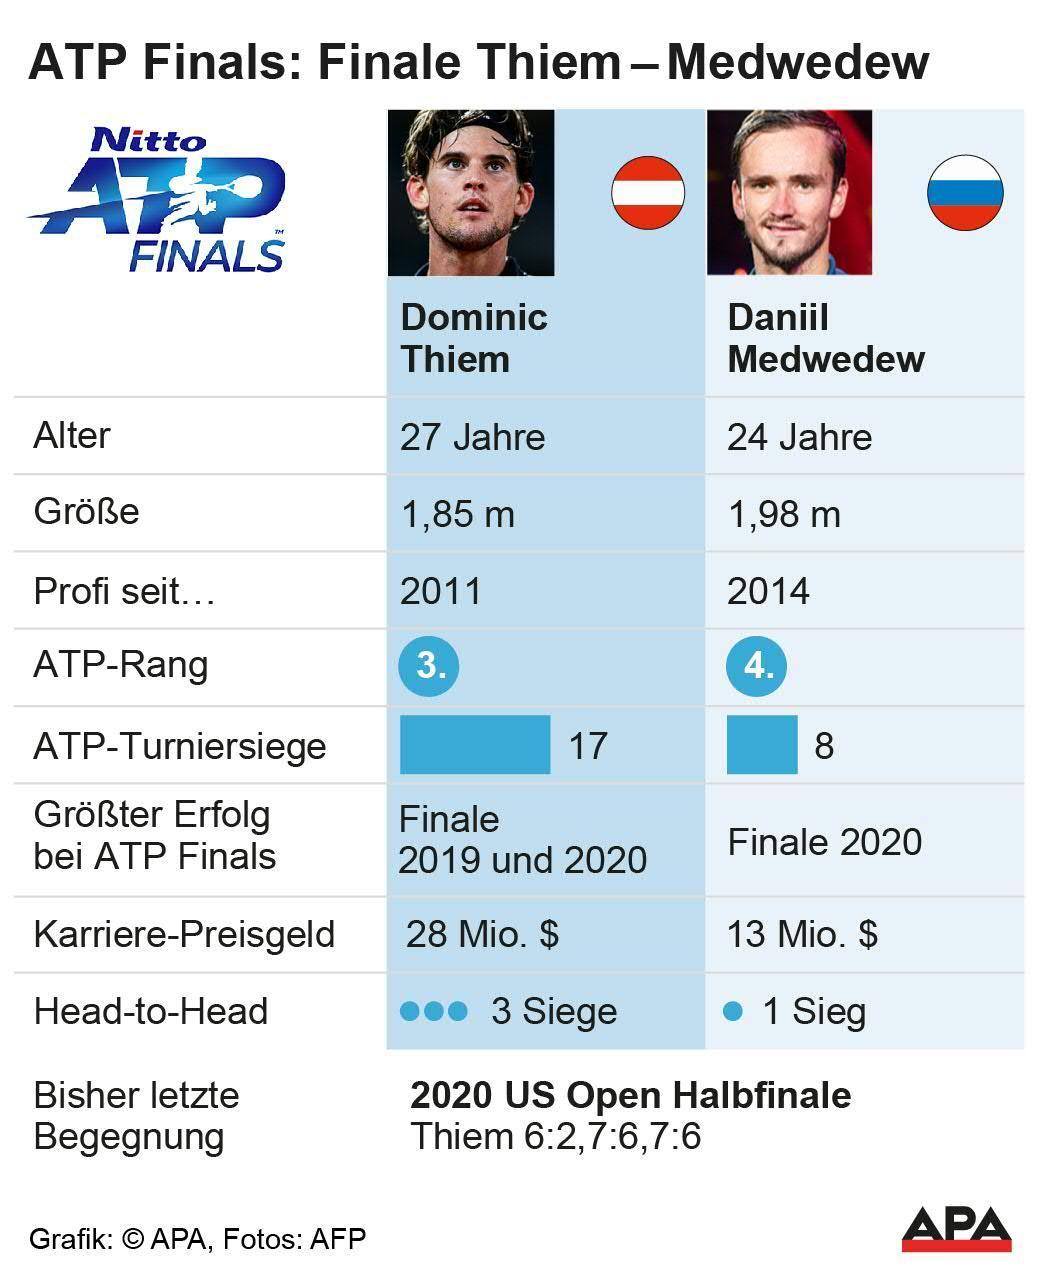 ATP Finals: Finale Thiem - Medwedew